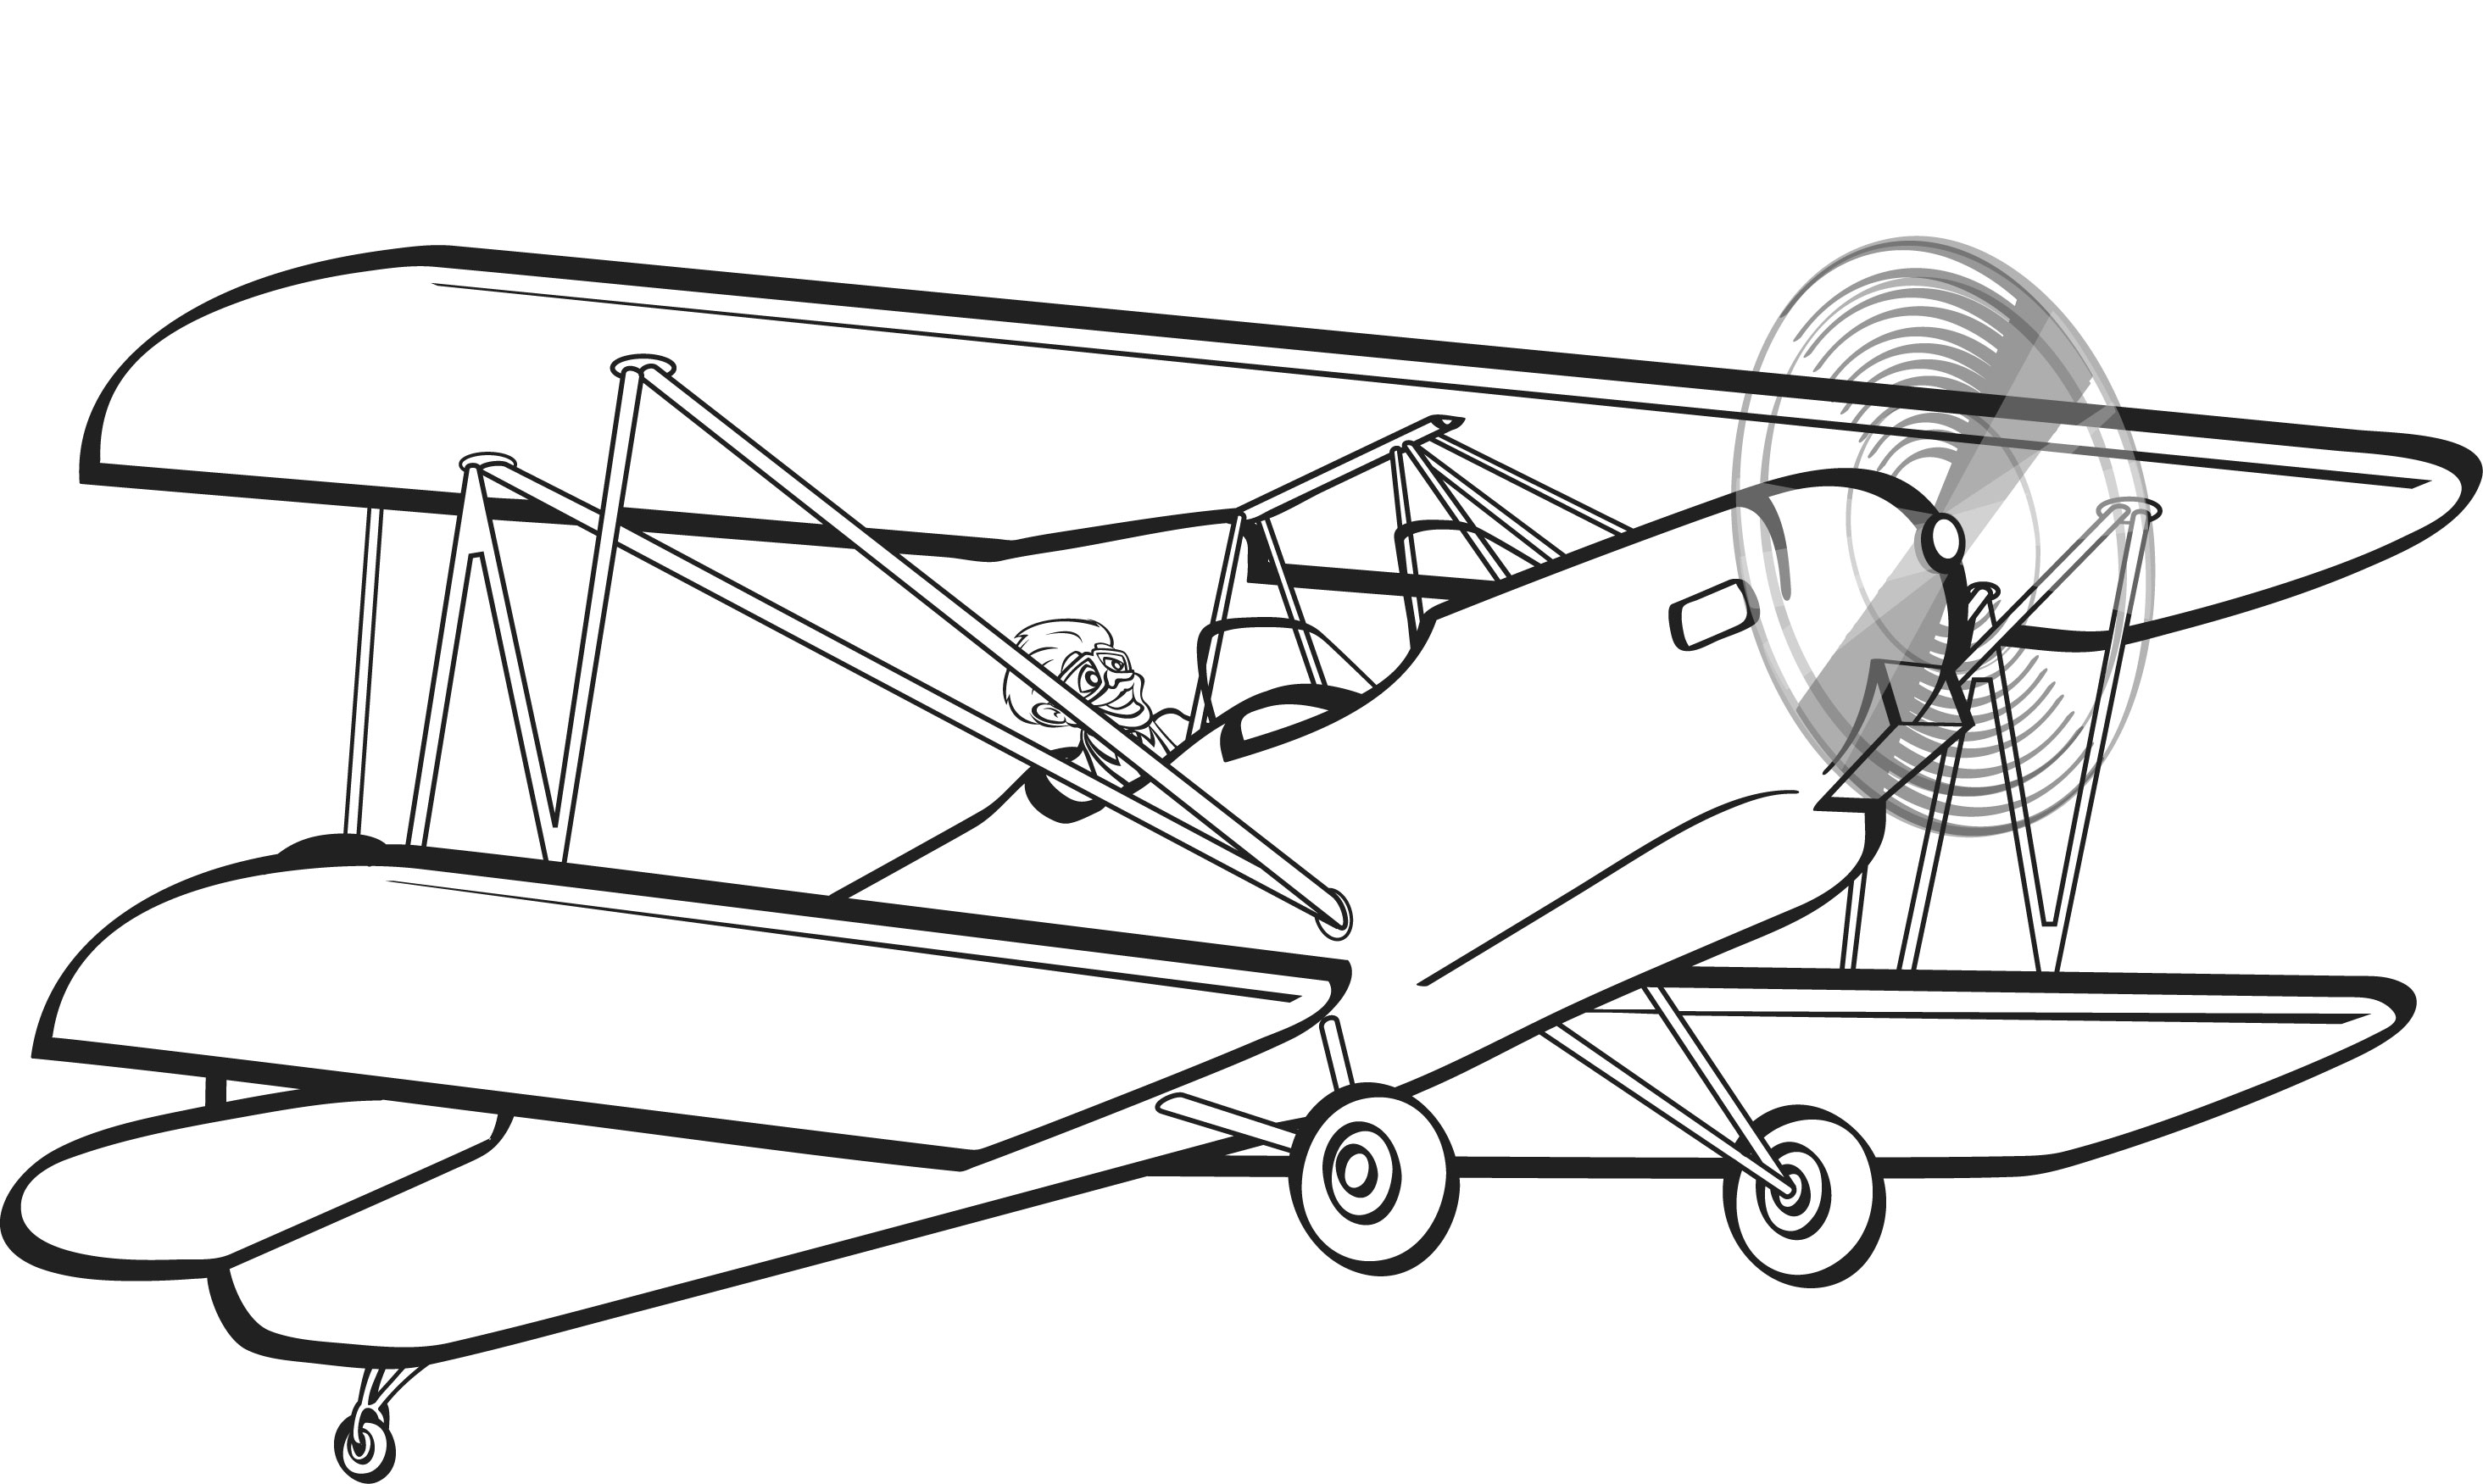 Biplane Clipart Biplane Clipart Biplane -Biplane Clipart Biplane Clipart Biplane Clipar-5